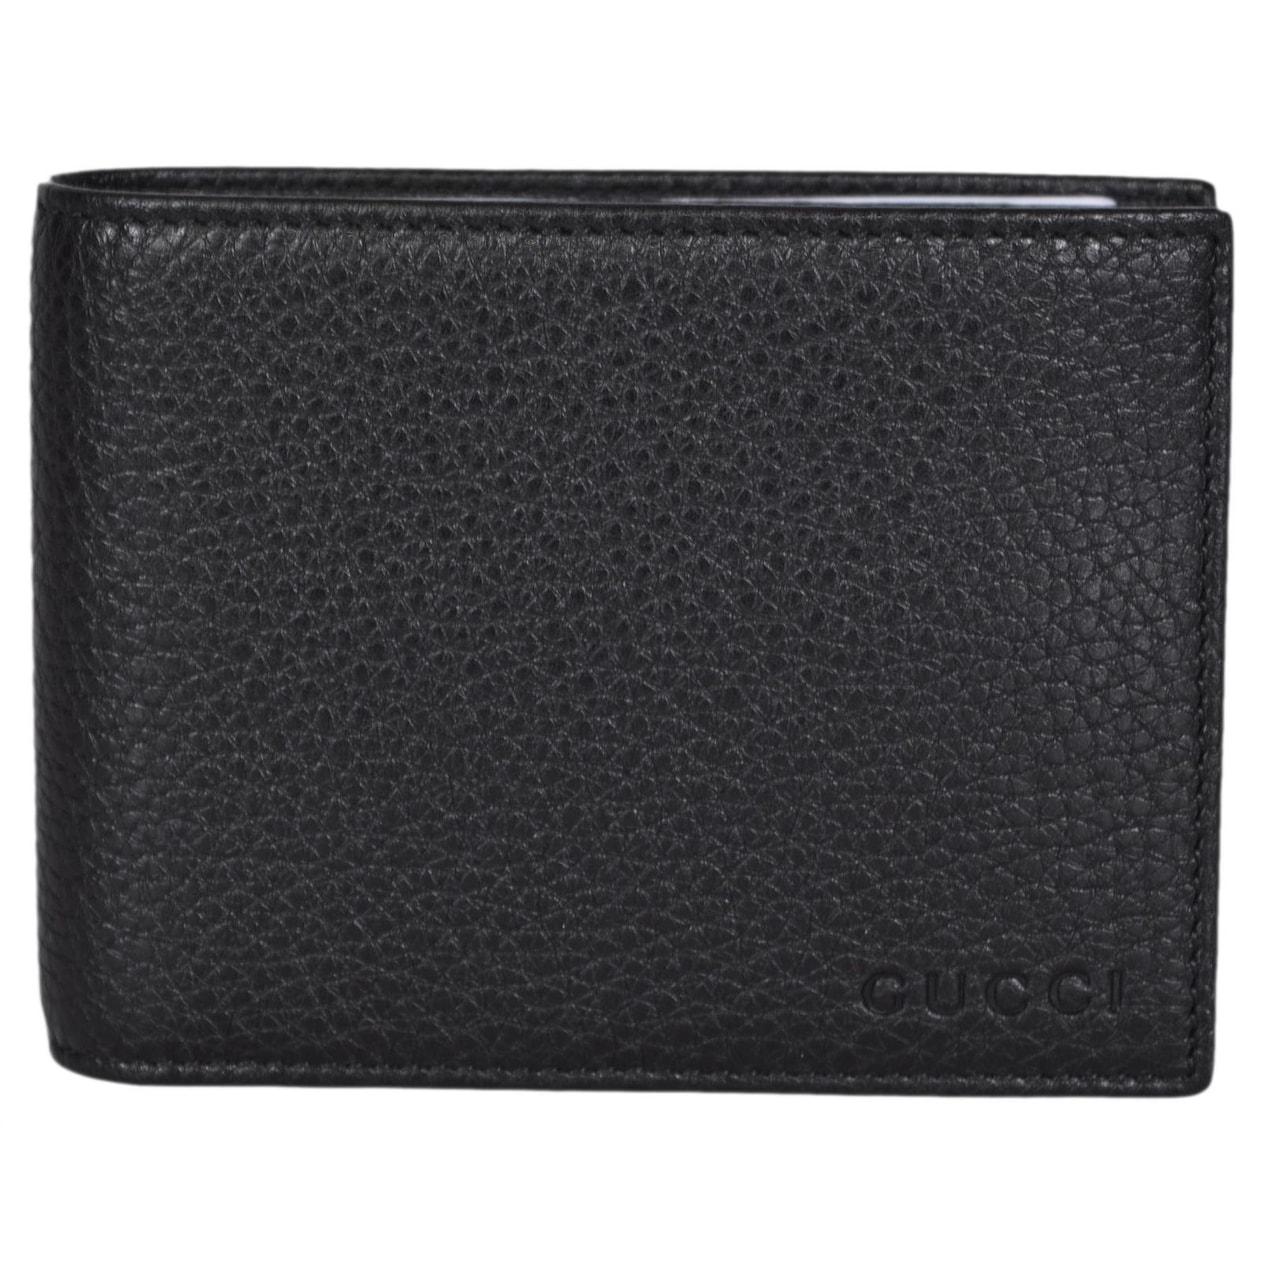 39af25f2332 Gucci Men s 333042 Black Textured Leather Logo Bifold Wallet W Removable ID  - 5